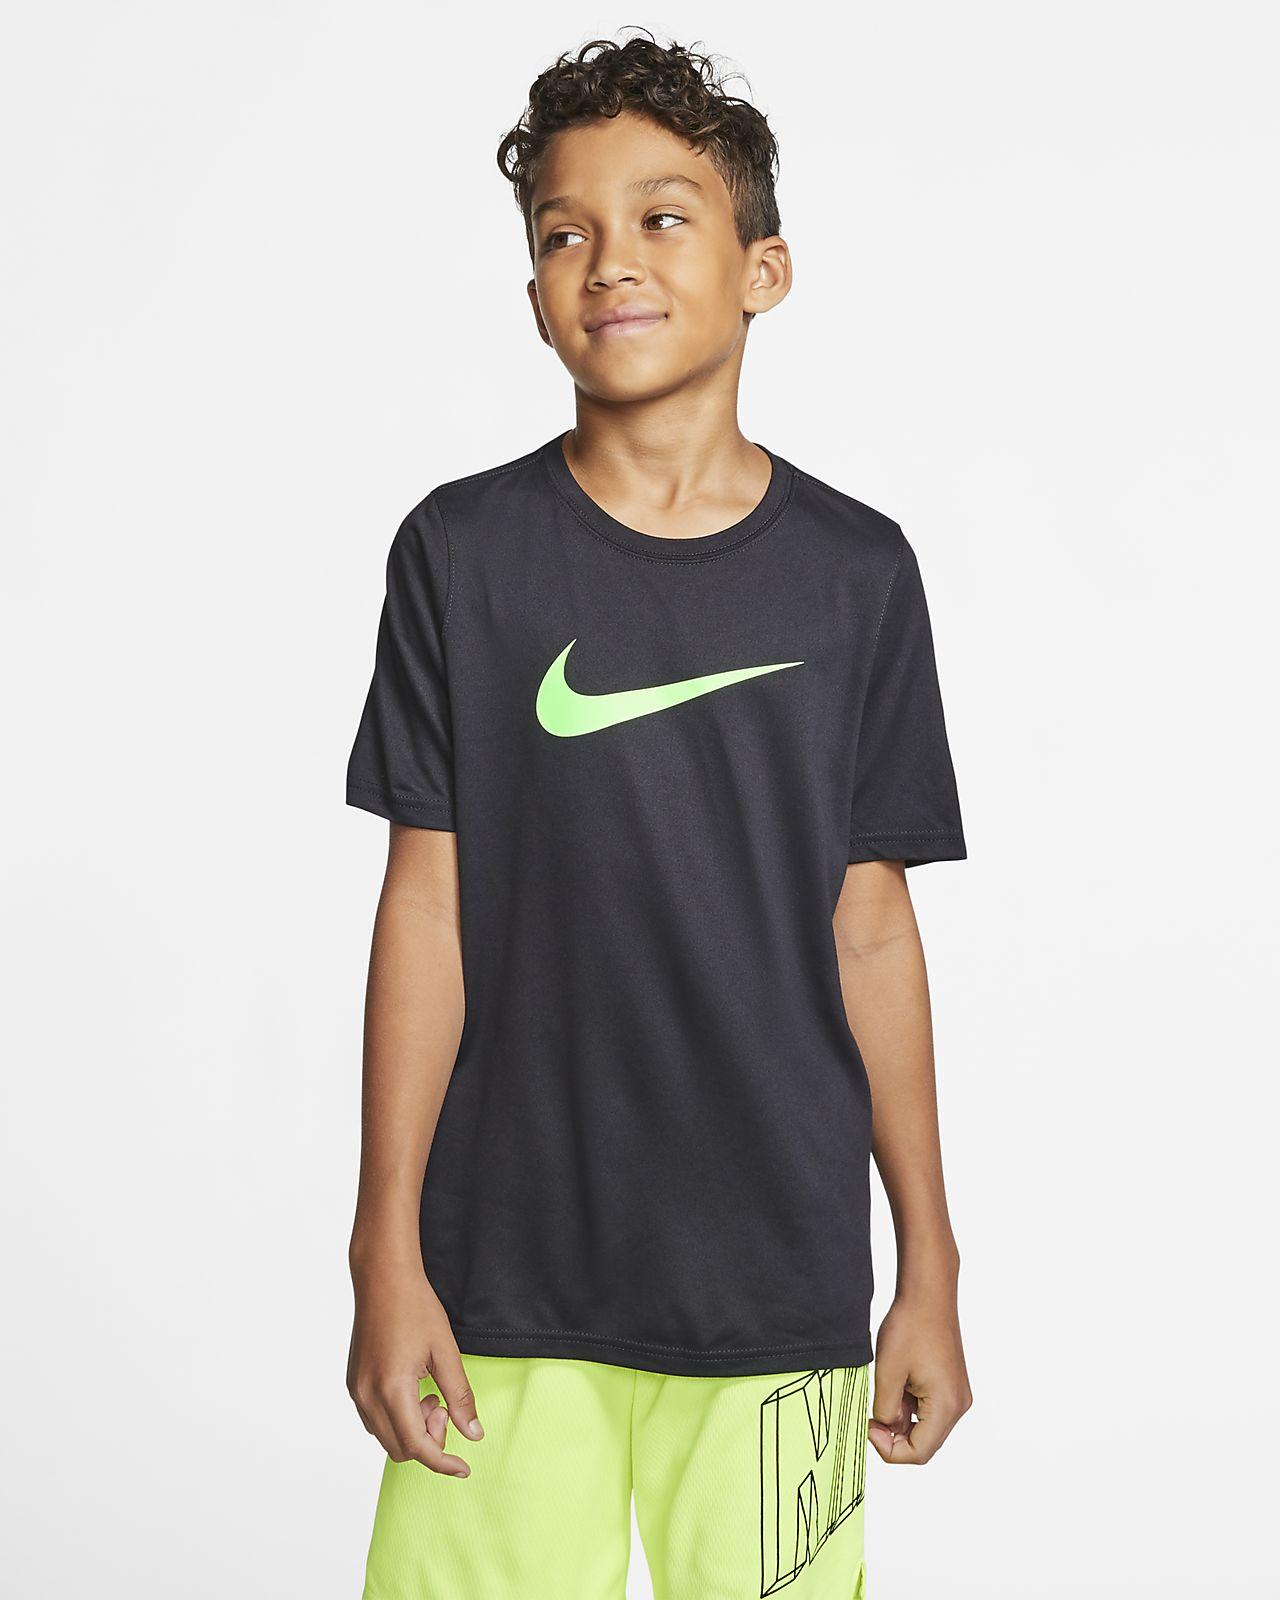 NIKE Men/'s Dri Fit Athletic Football Graphic T-Shirt Small Royal Blue NEW $30